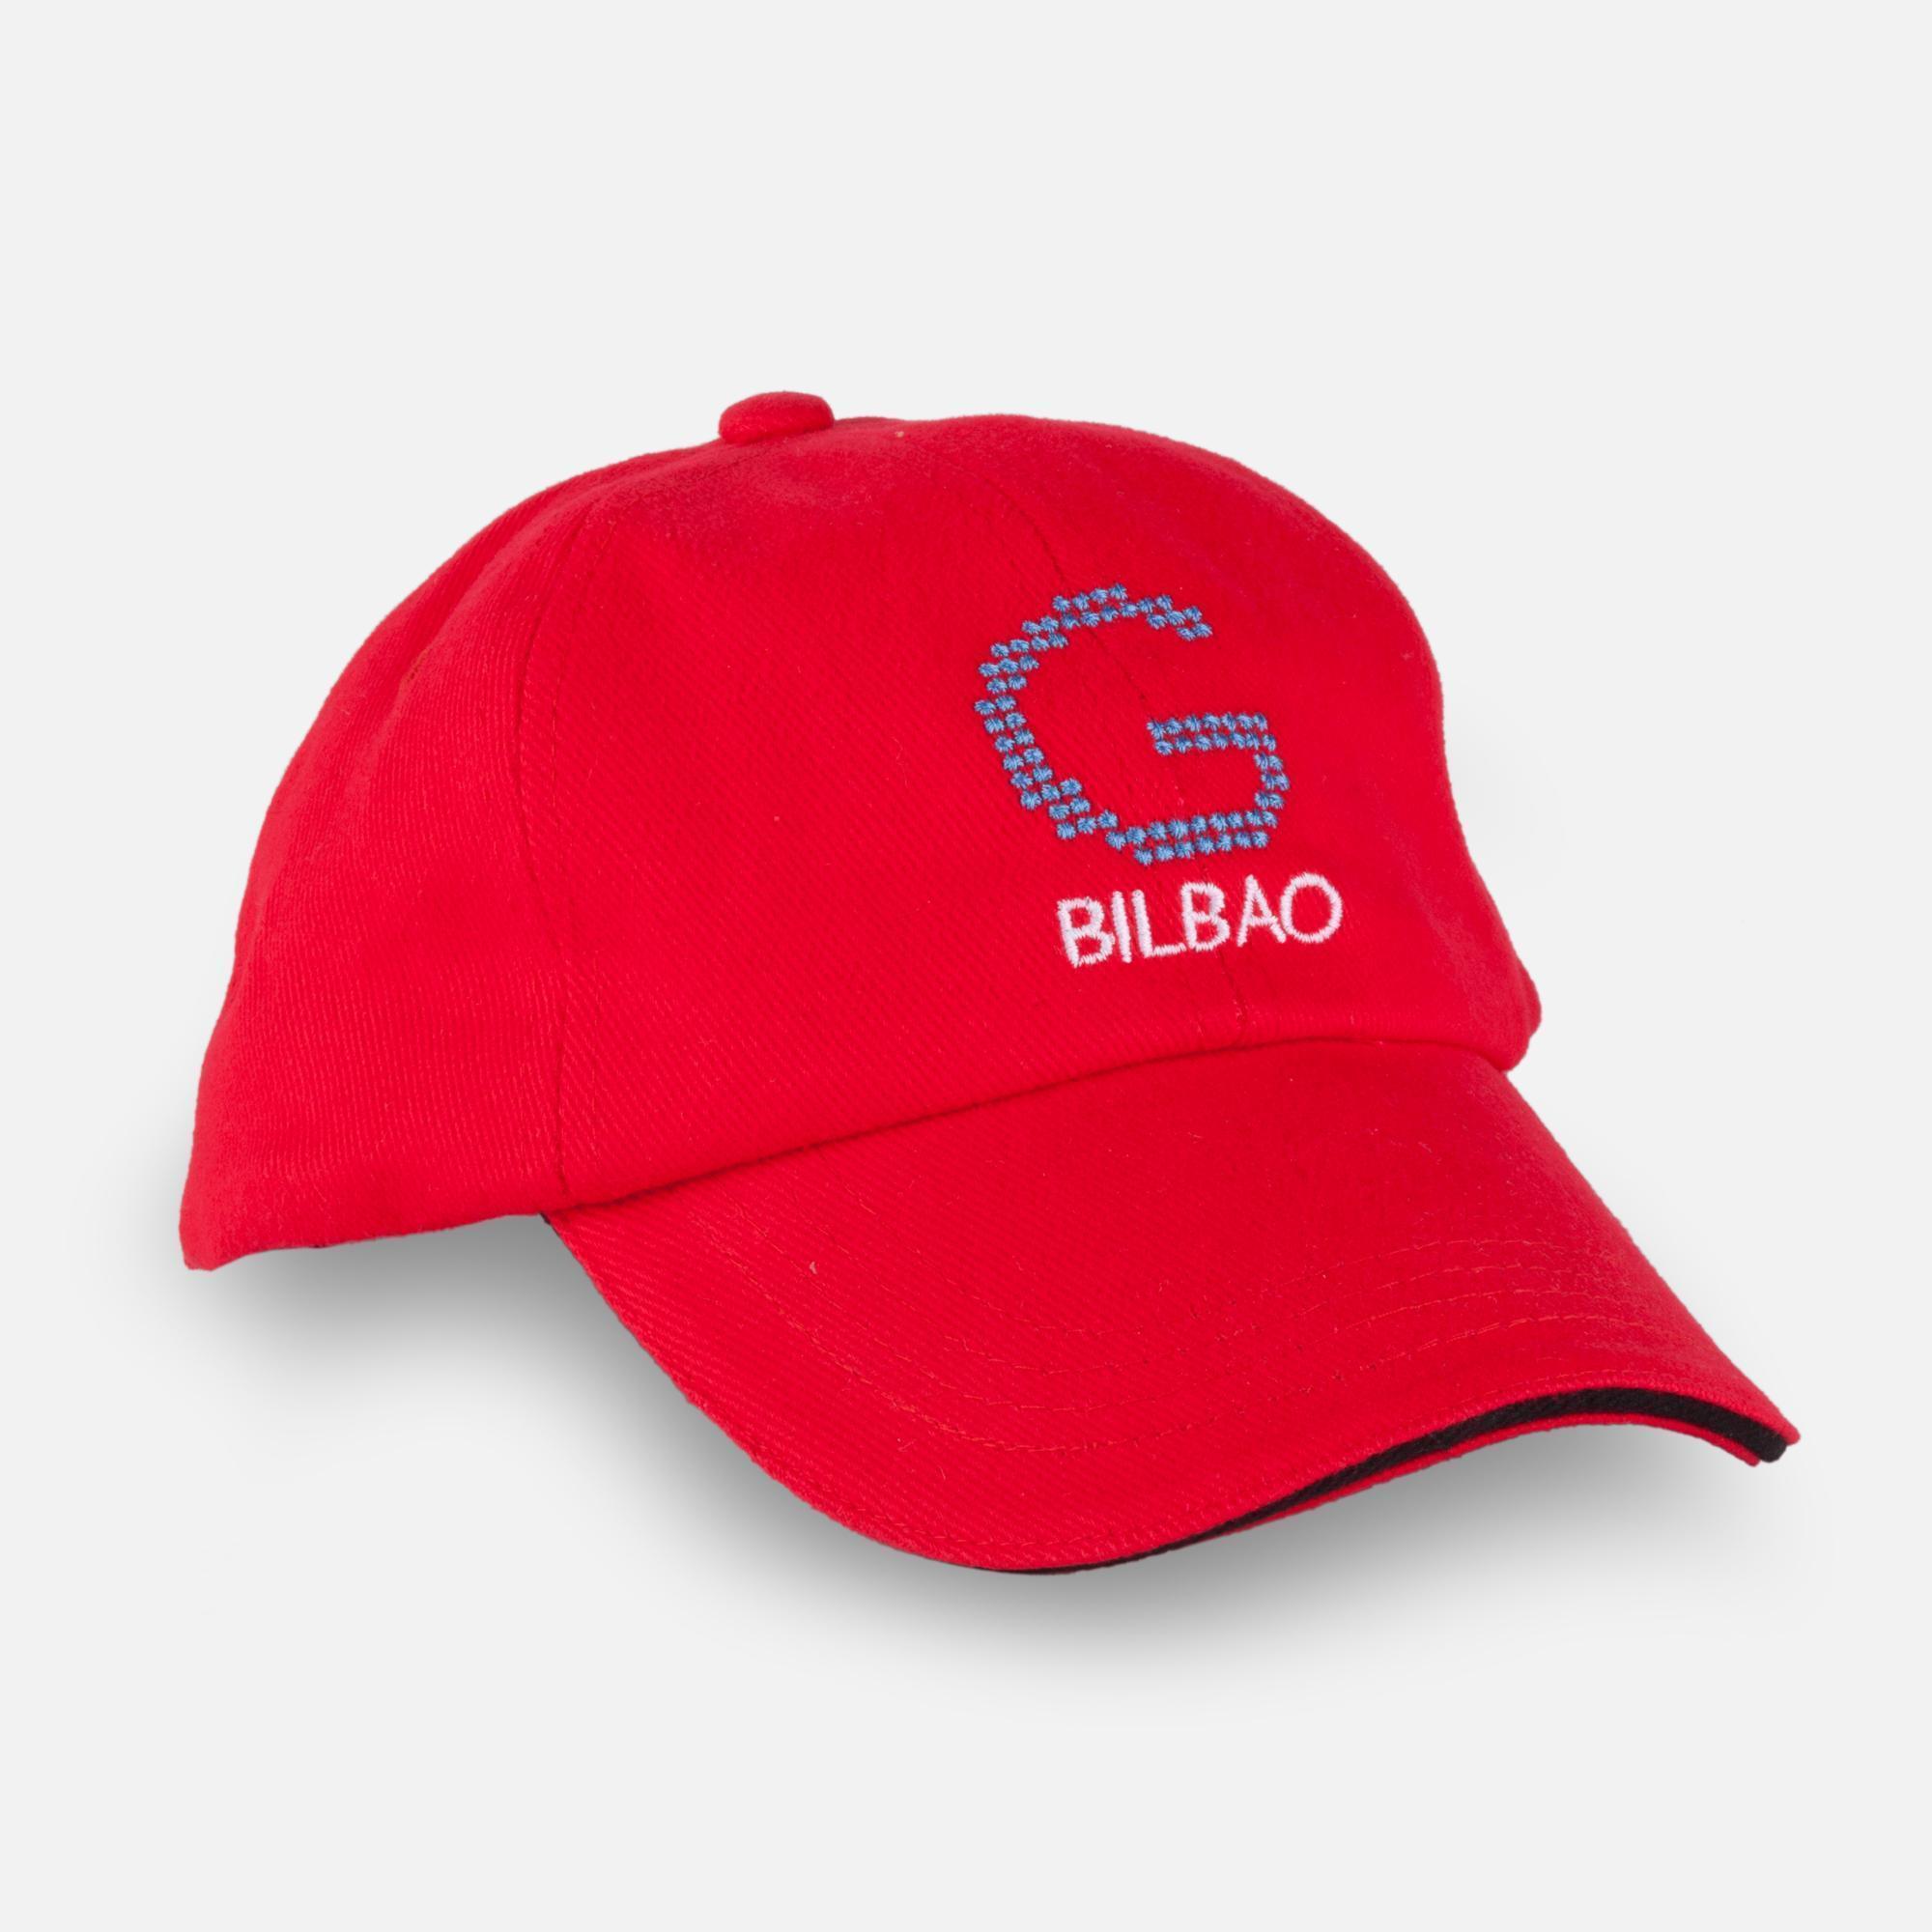 G CHILDREN'S cap